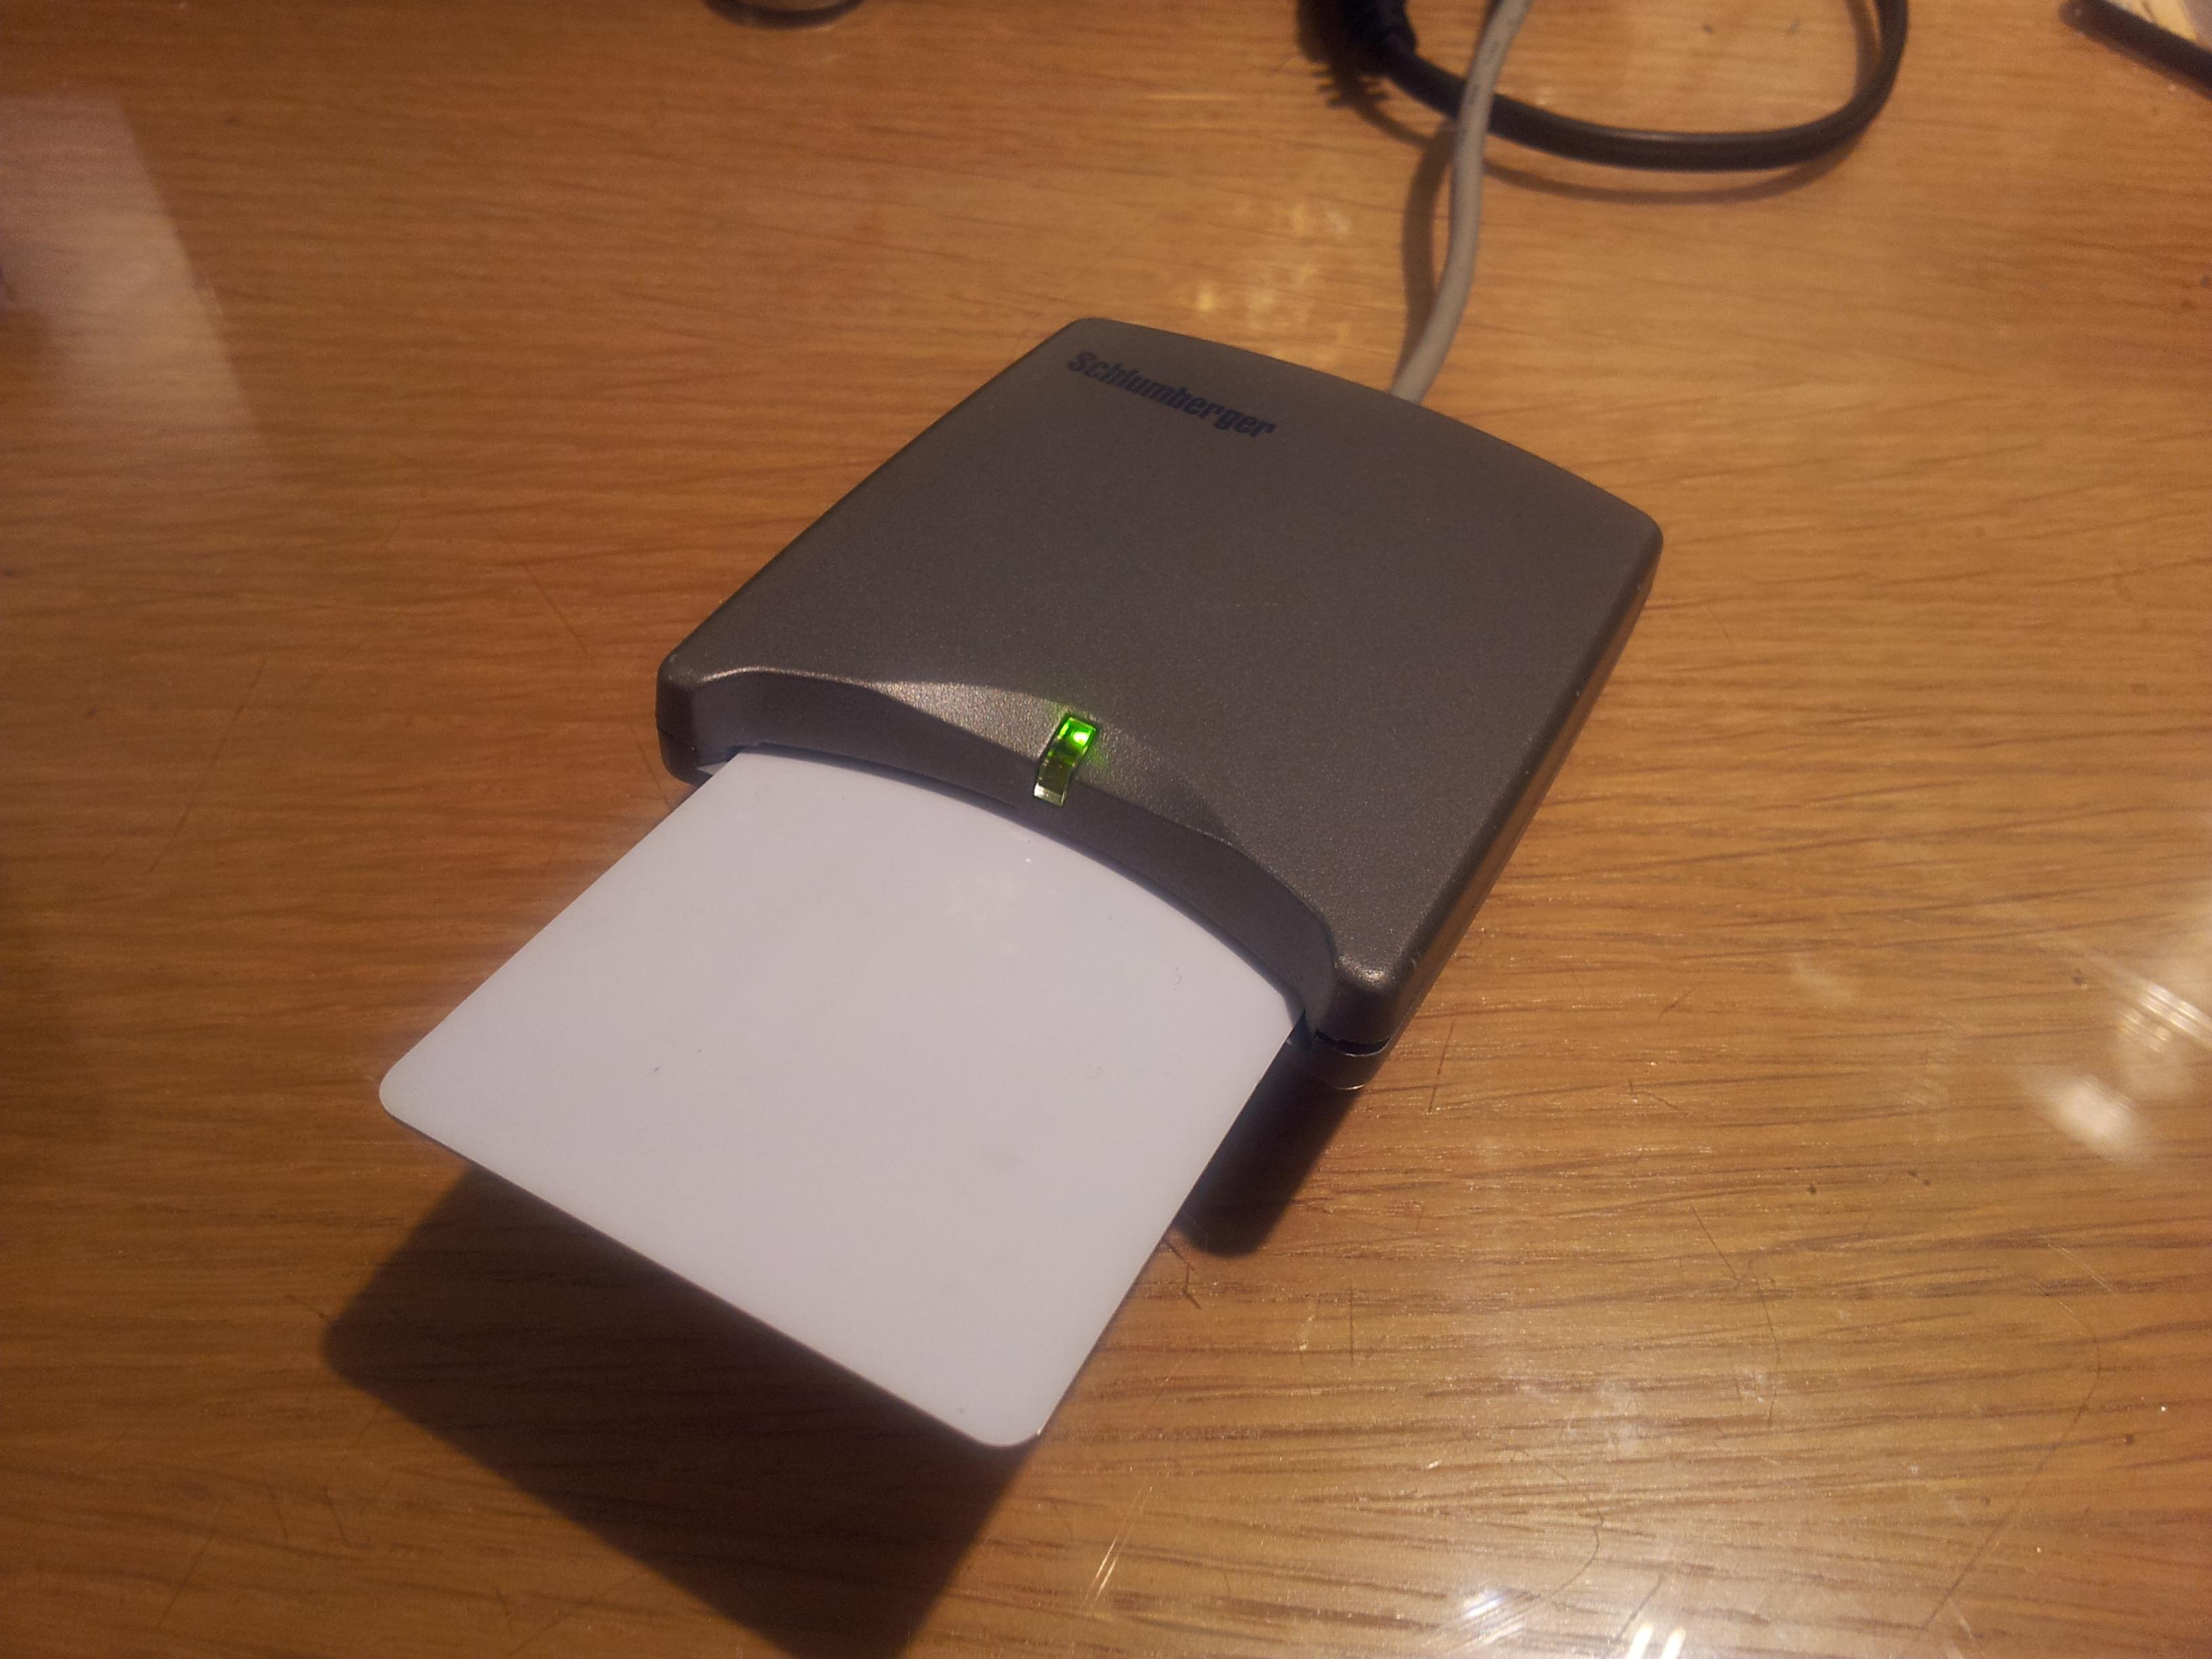 Slb reflex usb smart card reader